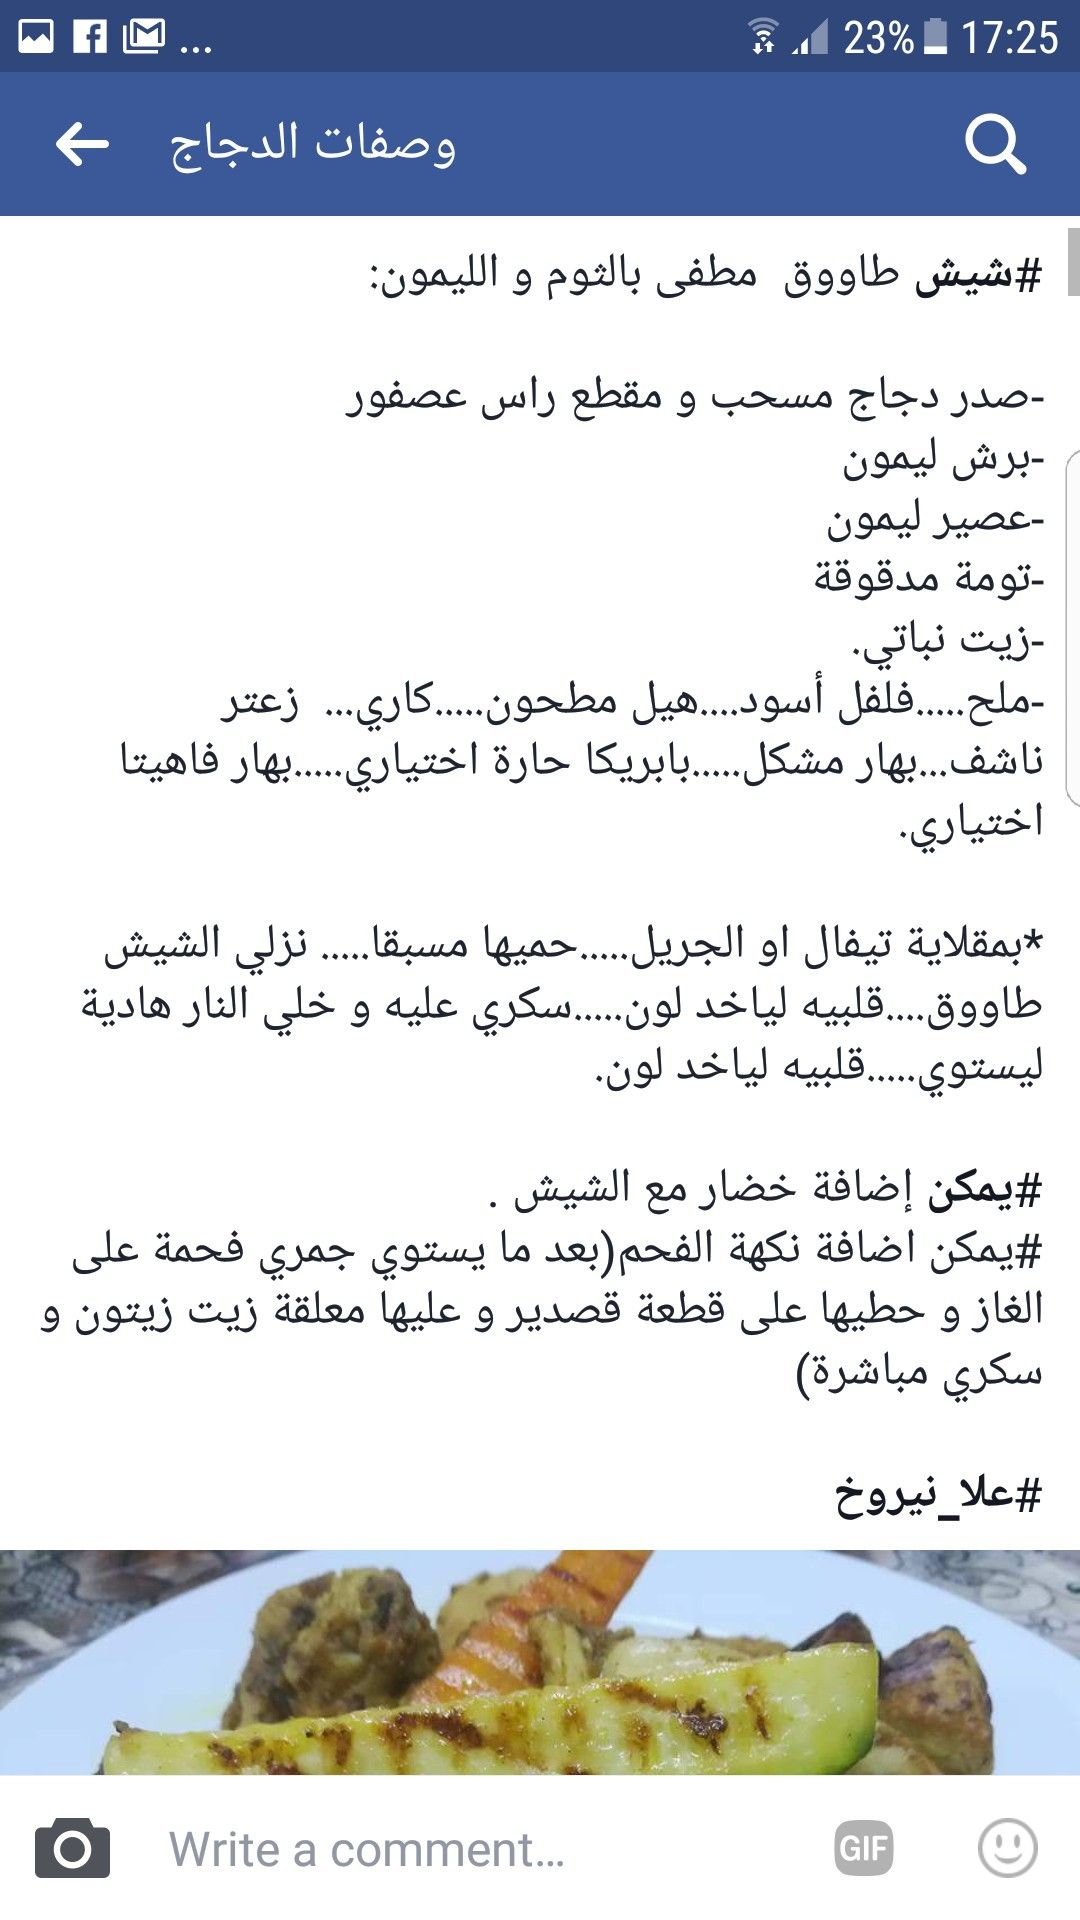 شيش طاووق مطفى بالثوم Arabic Food Recipes Yummy